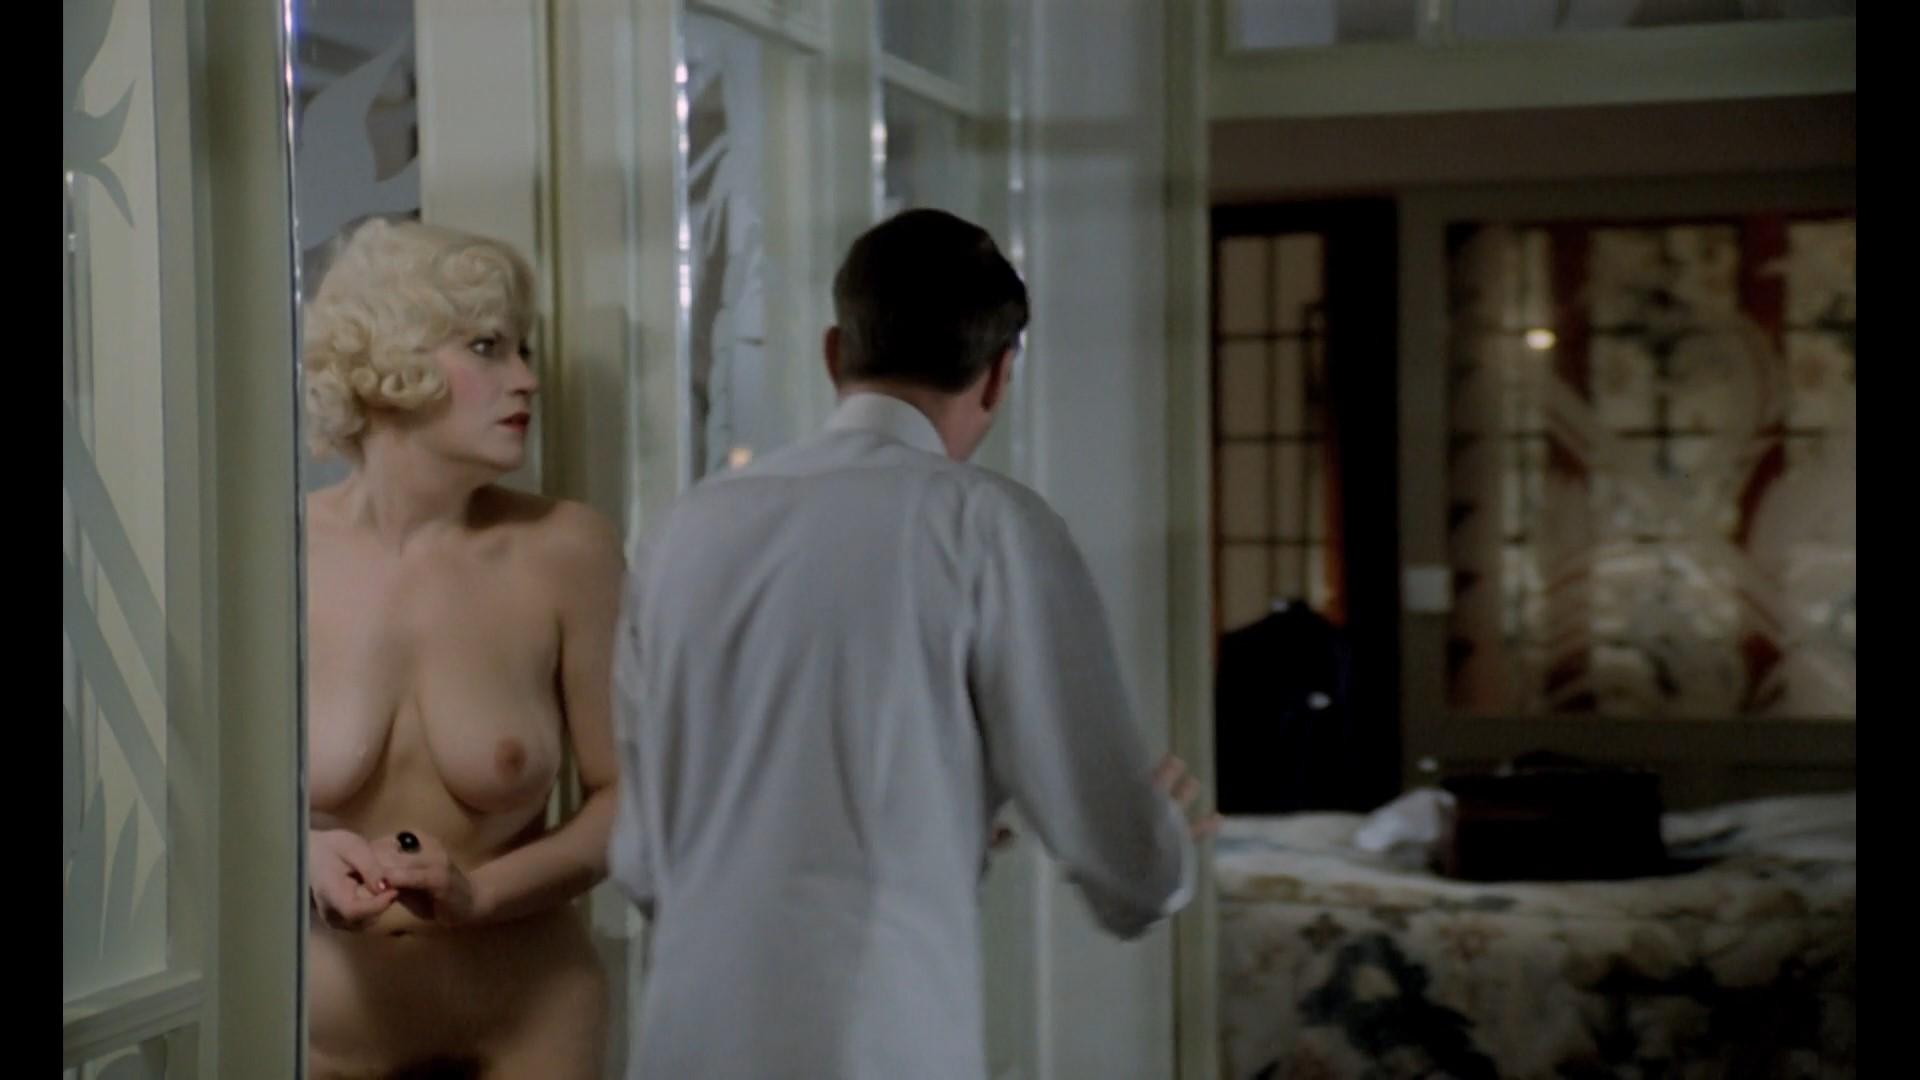 Andrea Osvárt Nuda materials for february 2018 year » page 144 » celebs nude